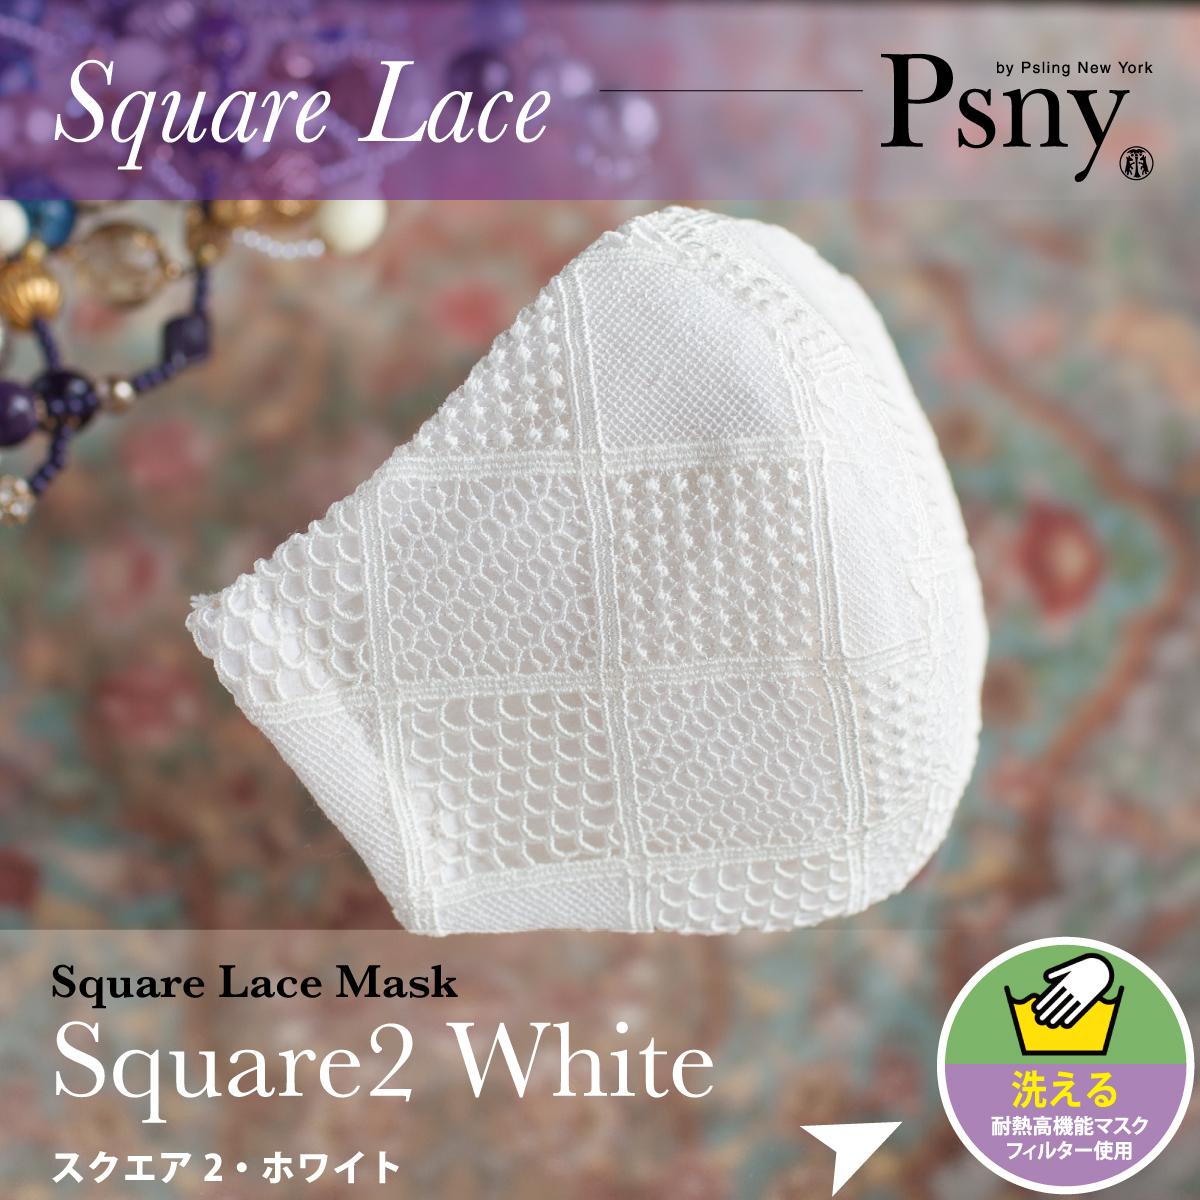 PSNY スクエア2・レース(ホワイト) 花粉 洗える不織布フィルター入り 立体 大人用 黄砂 卒業式 マスク 送料無料 L31